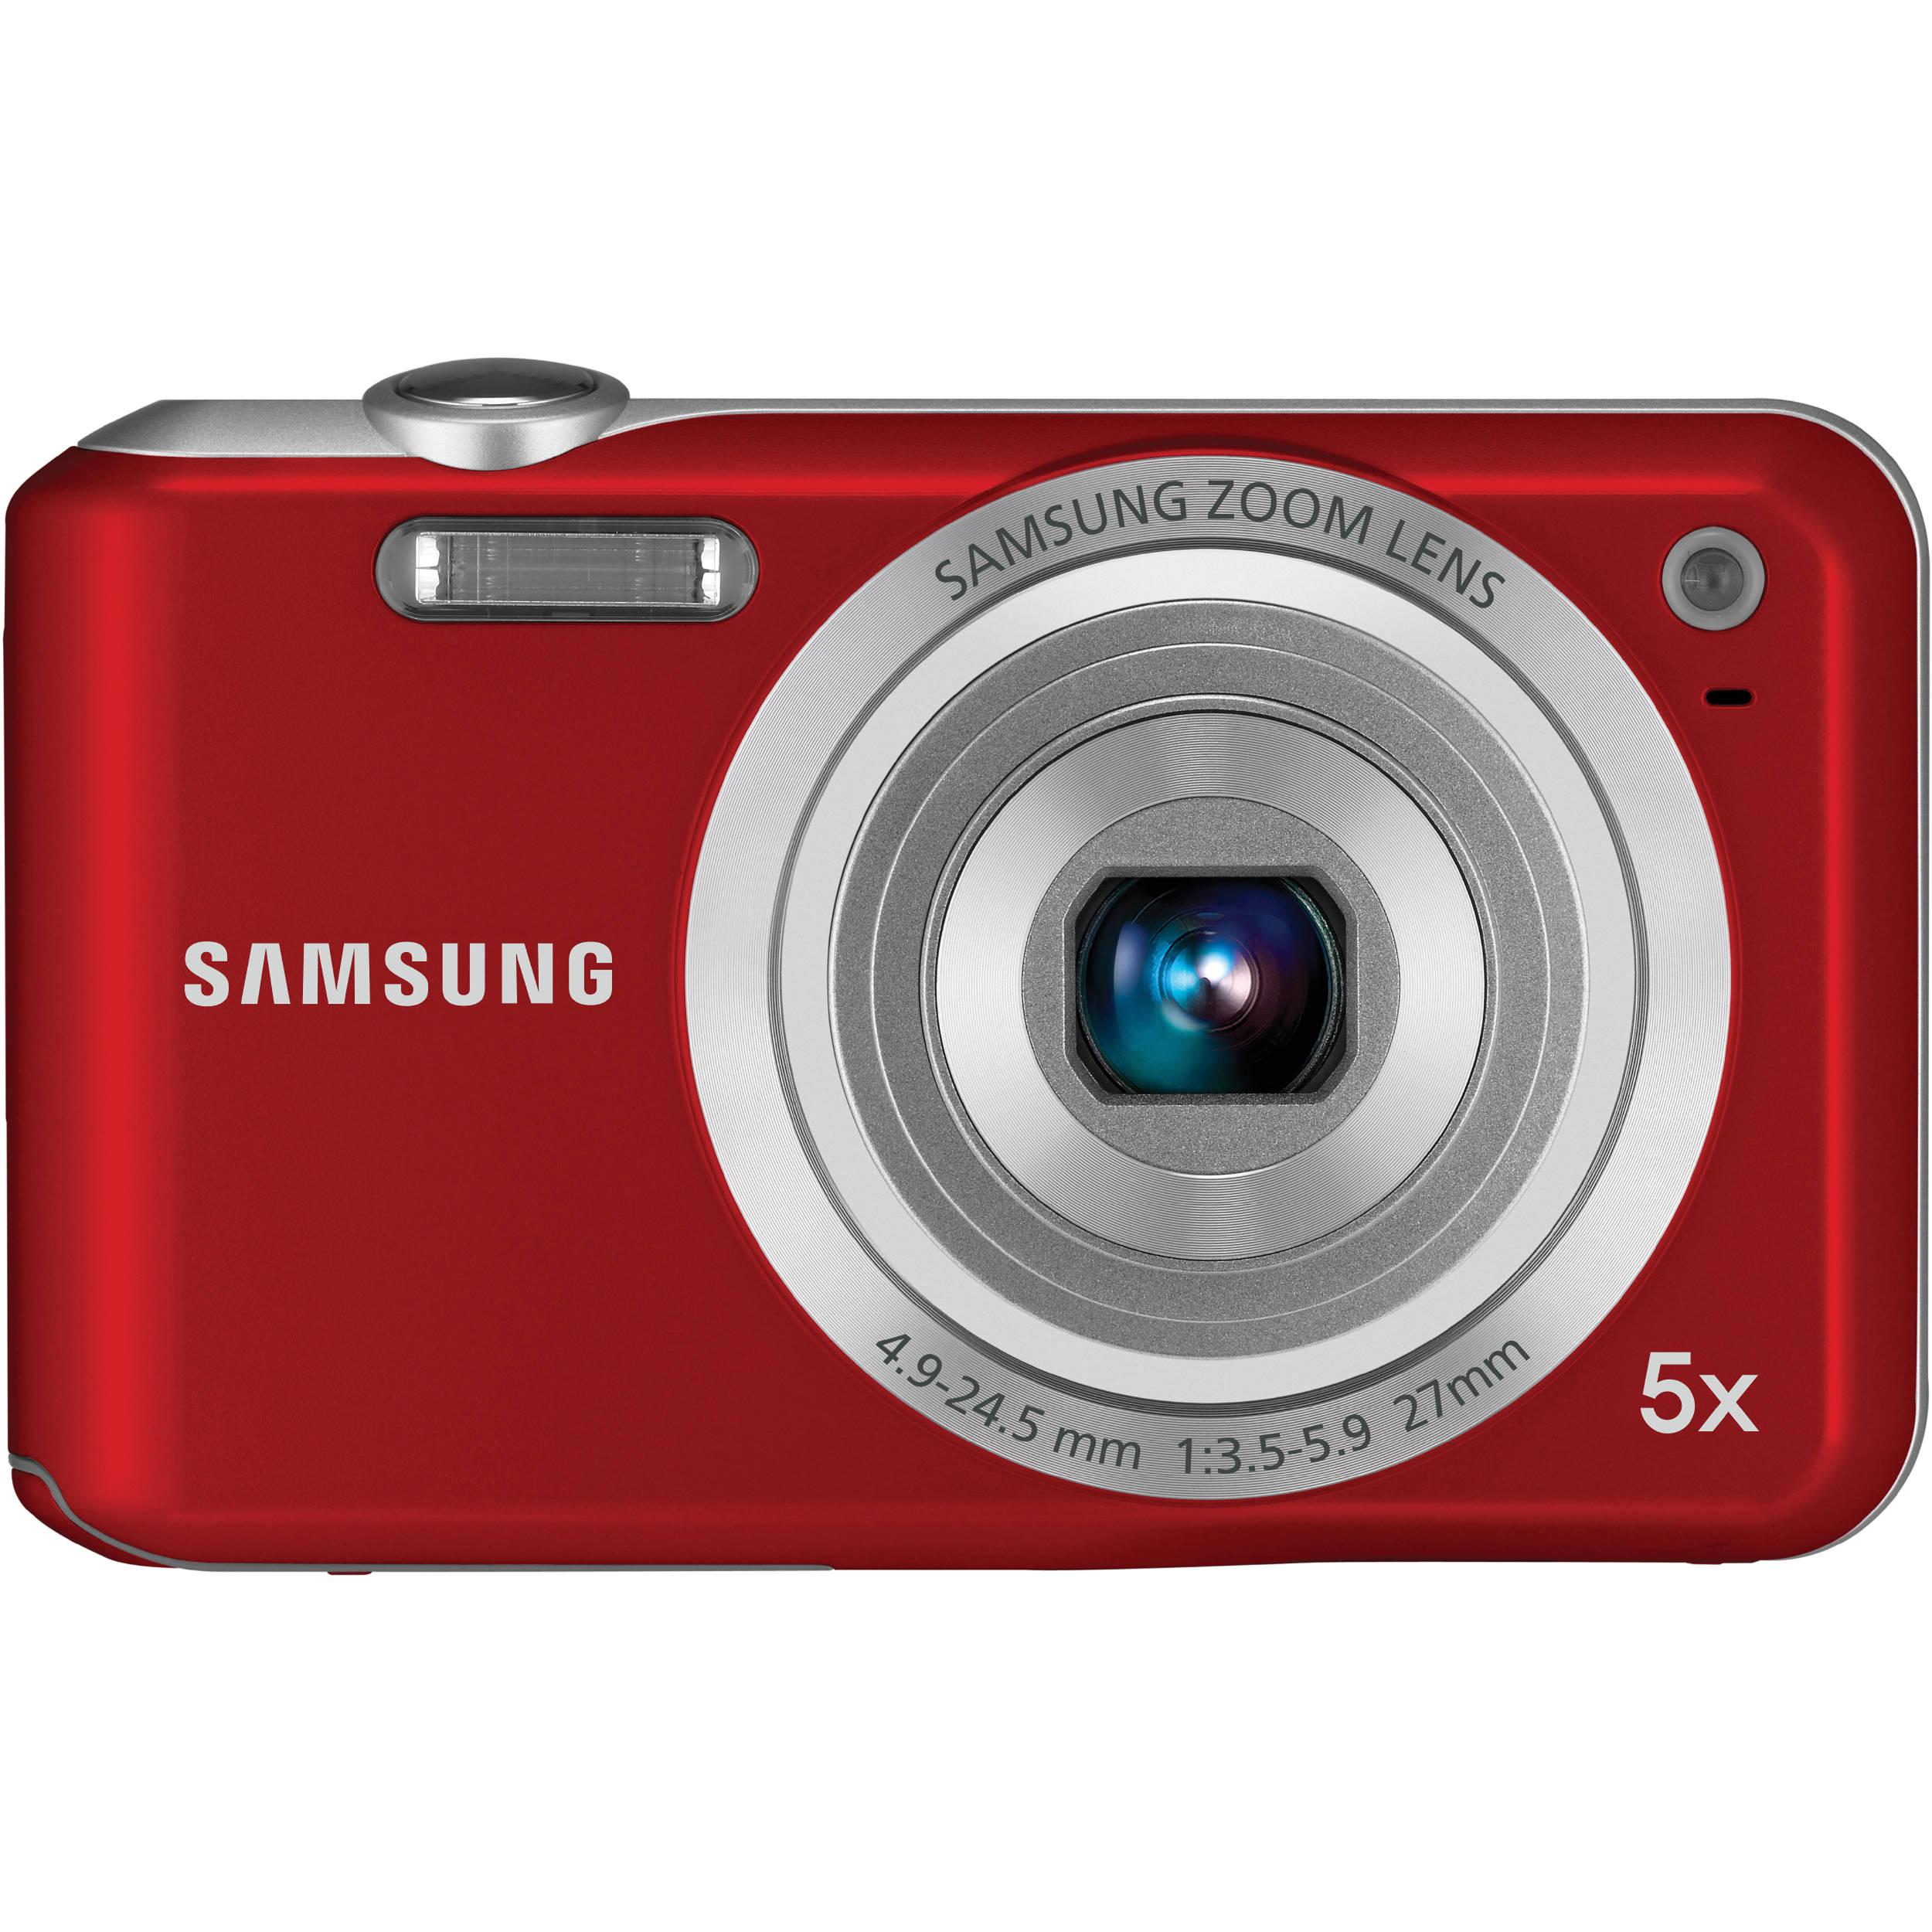 Samsung SL50 Digital Camera (Red) EC-SL50ZZBPRUS B&H Photo ...